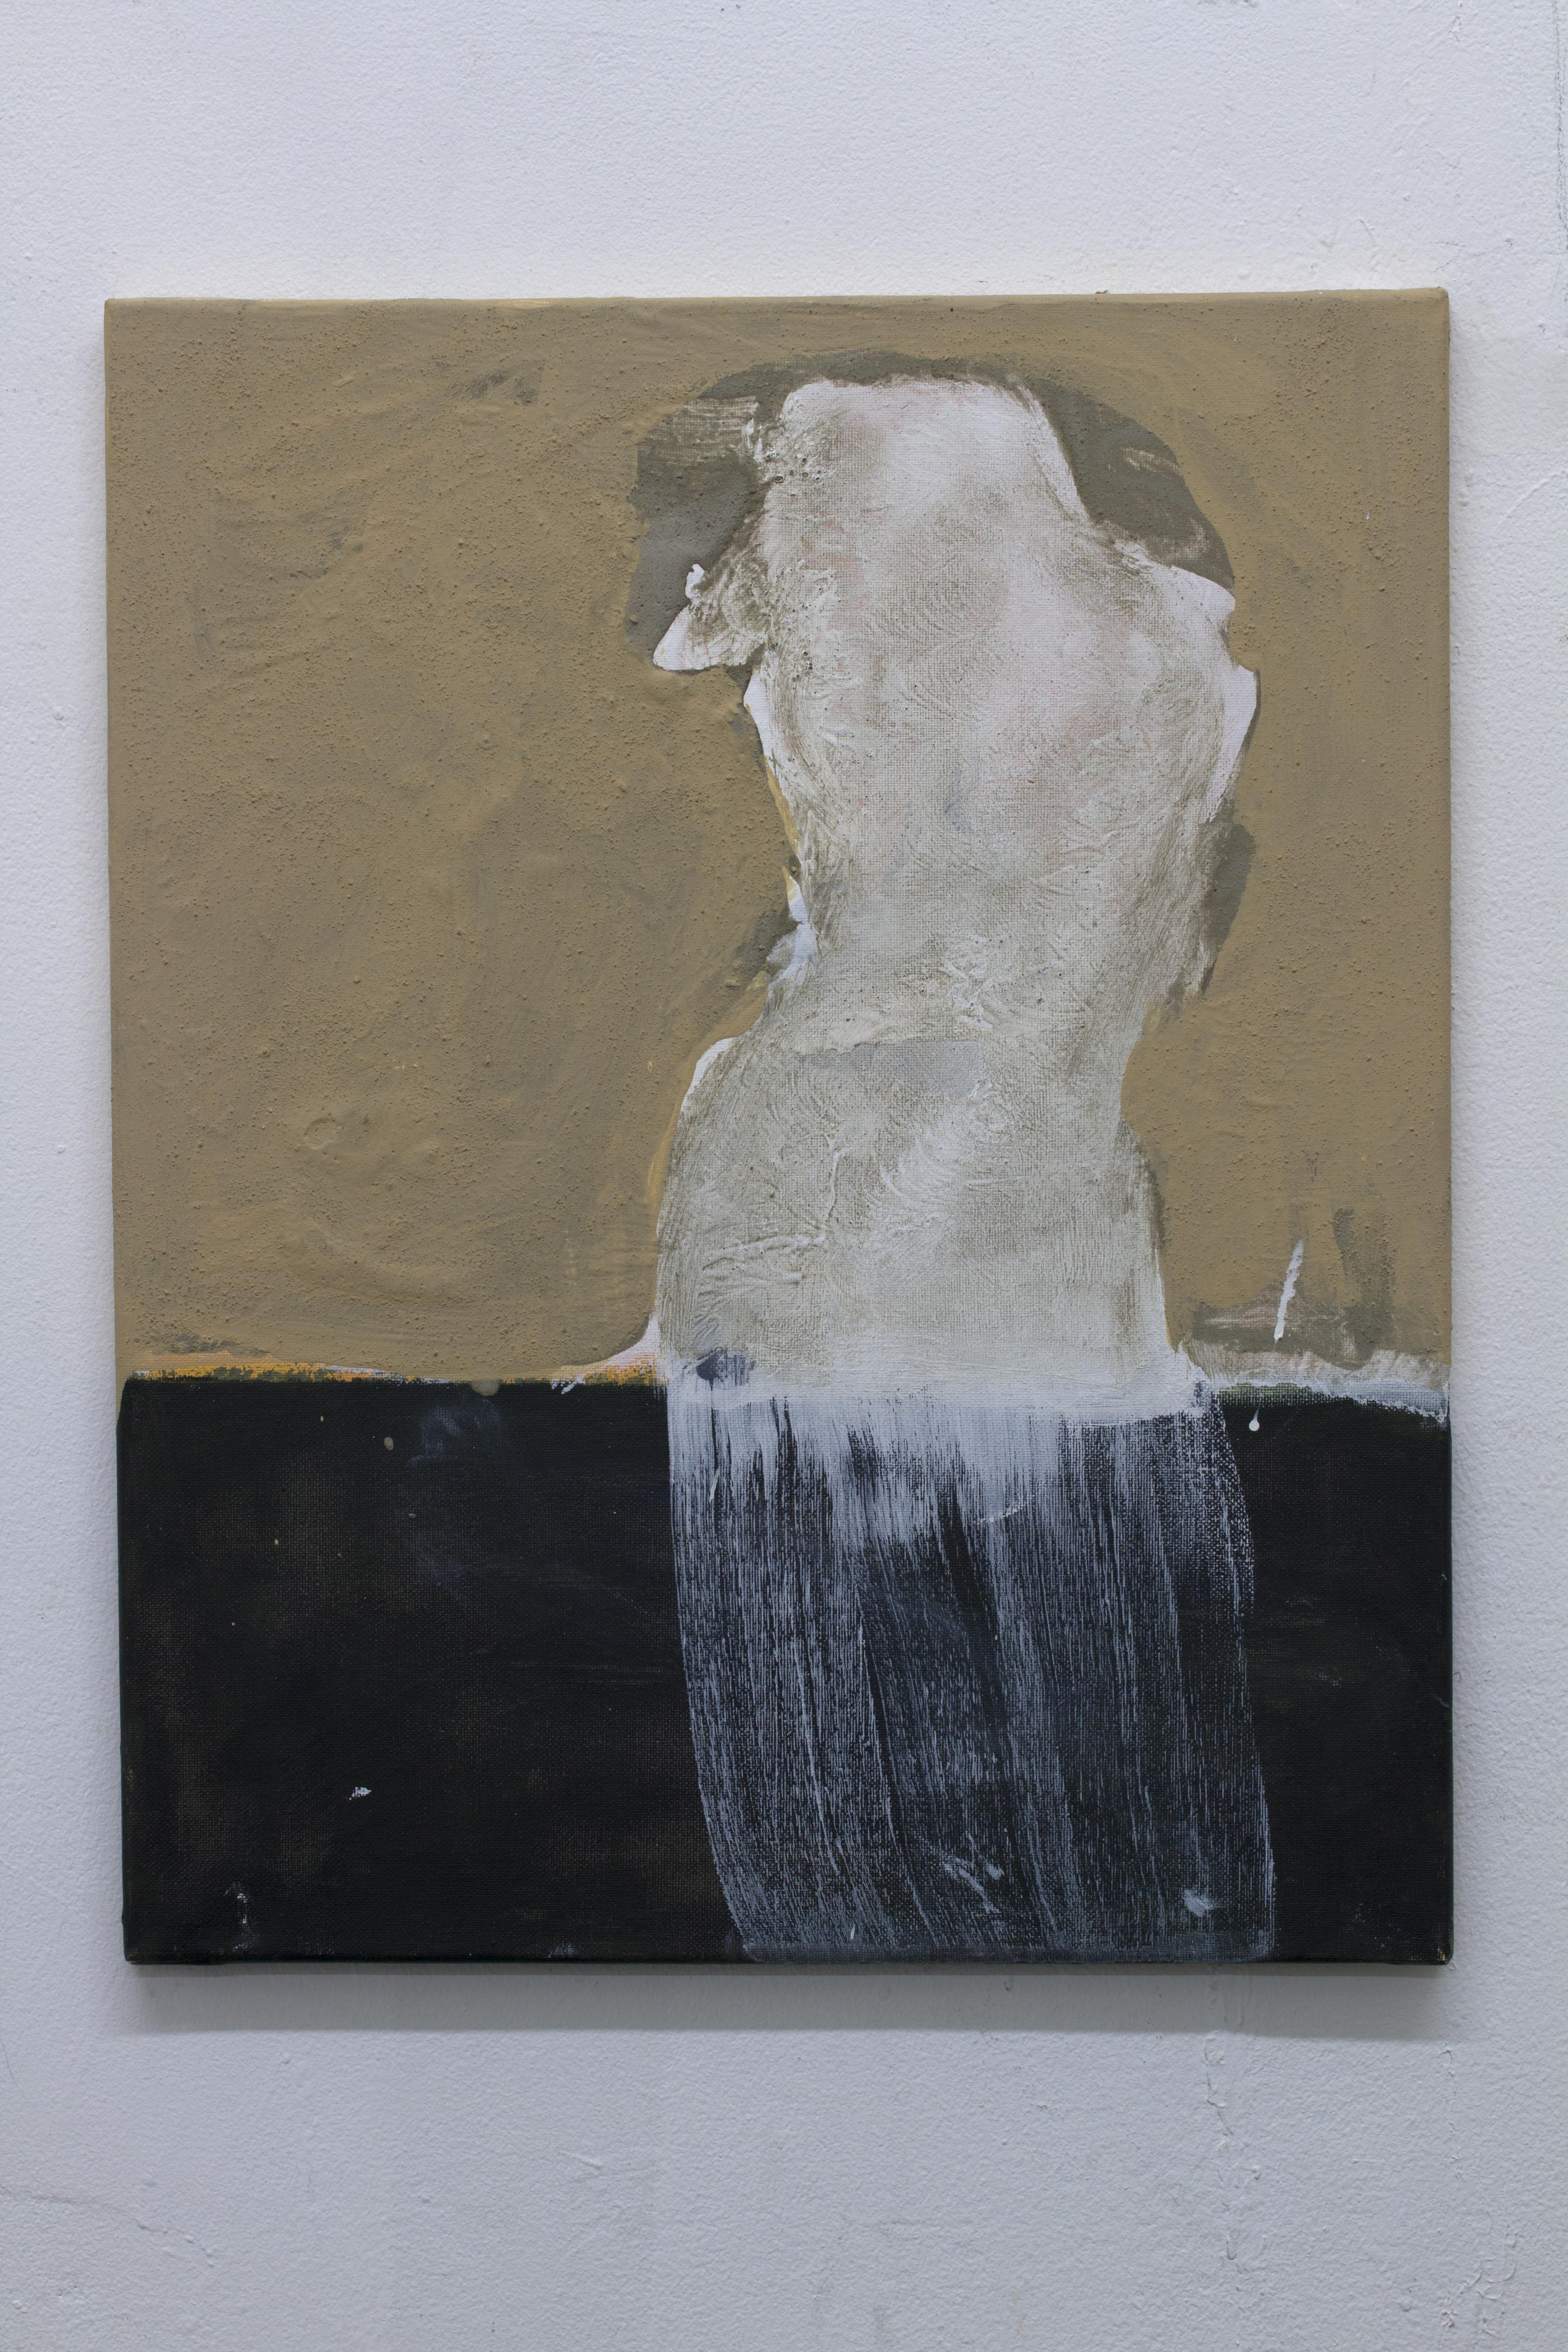 La Statua Perduta - Kamran Taherimoghaddam - 20x16